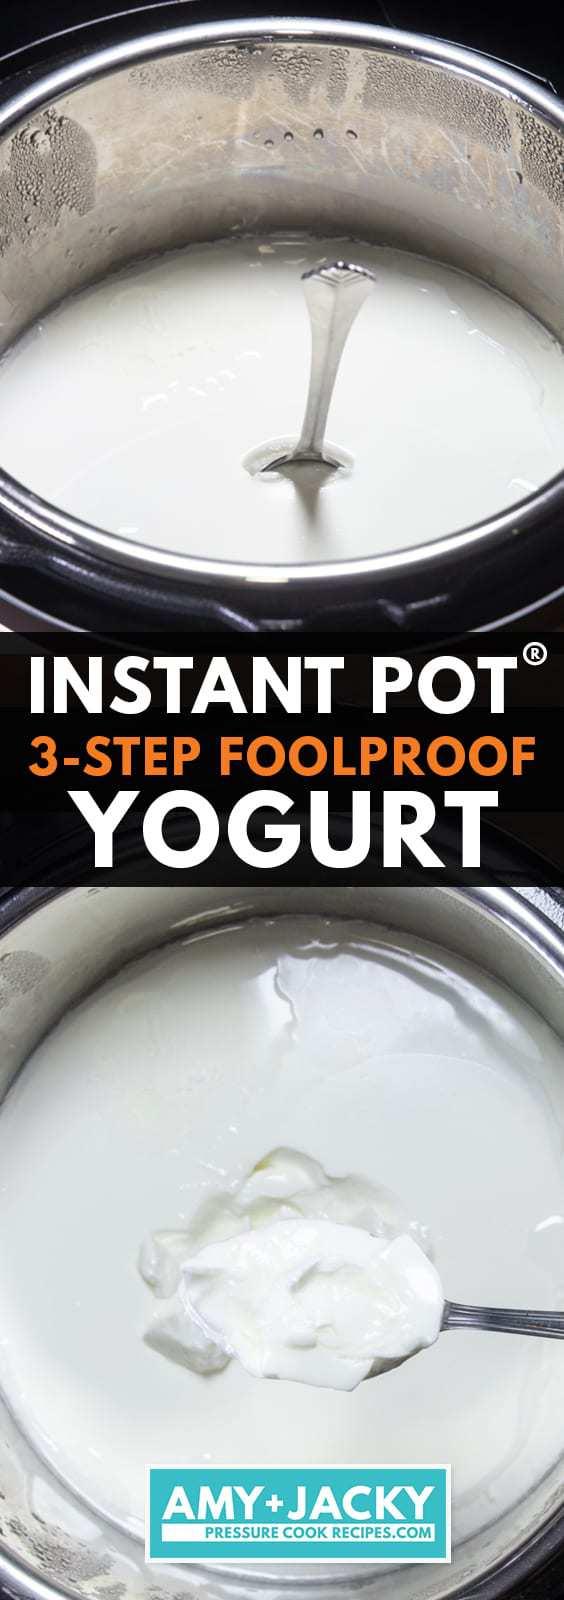 Instant Pot Yogurt | Instant Pot Yogurt No Boil | Instant Pot Yogurt Fairlife | Instant Pot Yogurt Cold Start #AmyJacky #InstantPot #PressureCooker #recipe #keto #healthy #breakfast